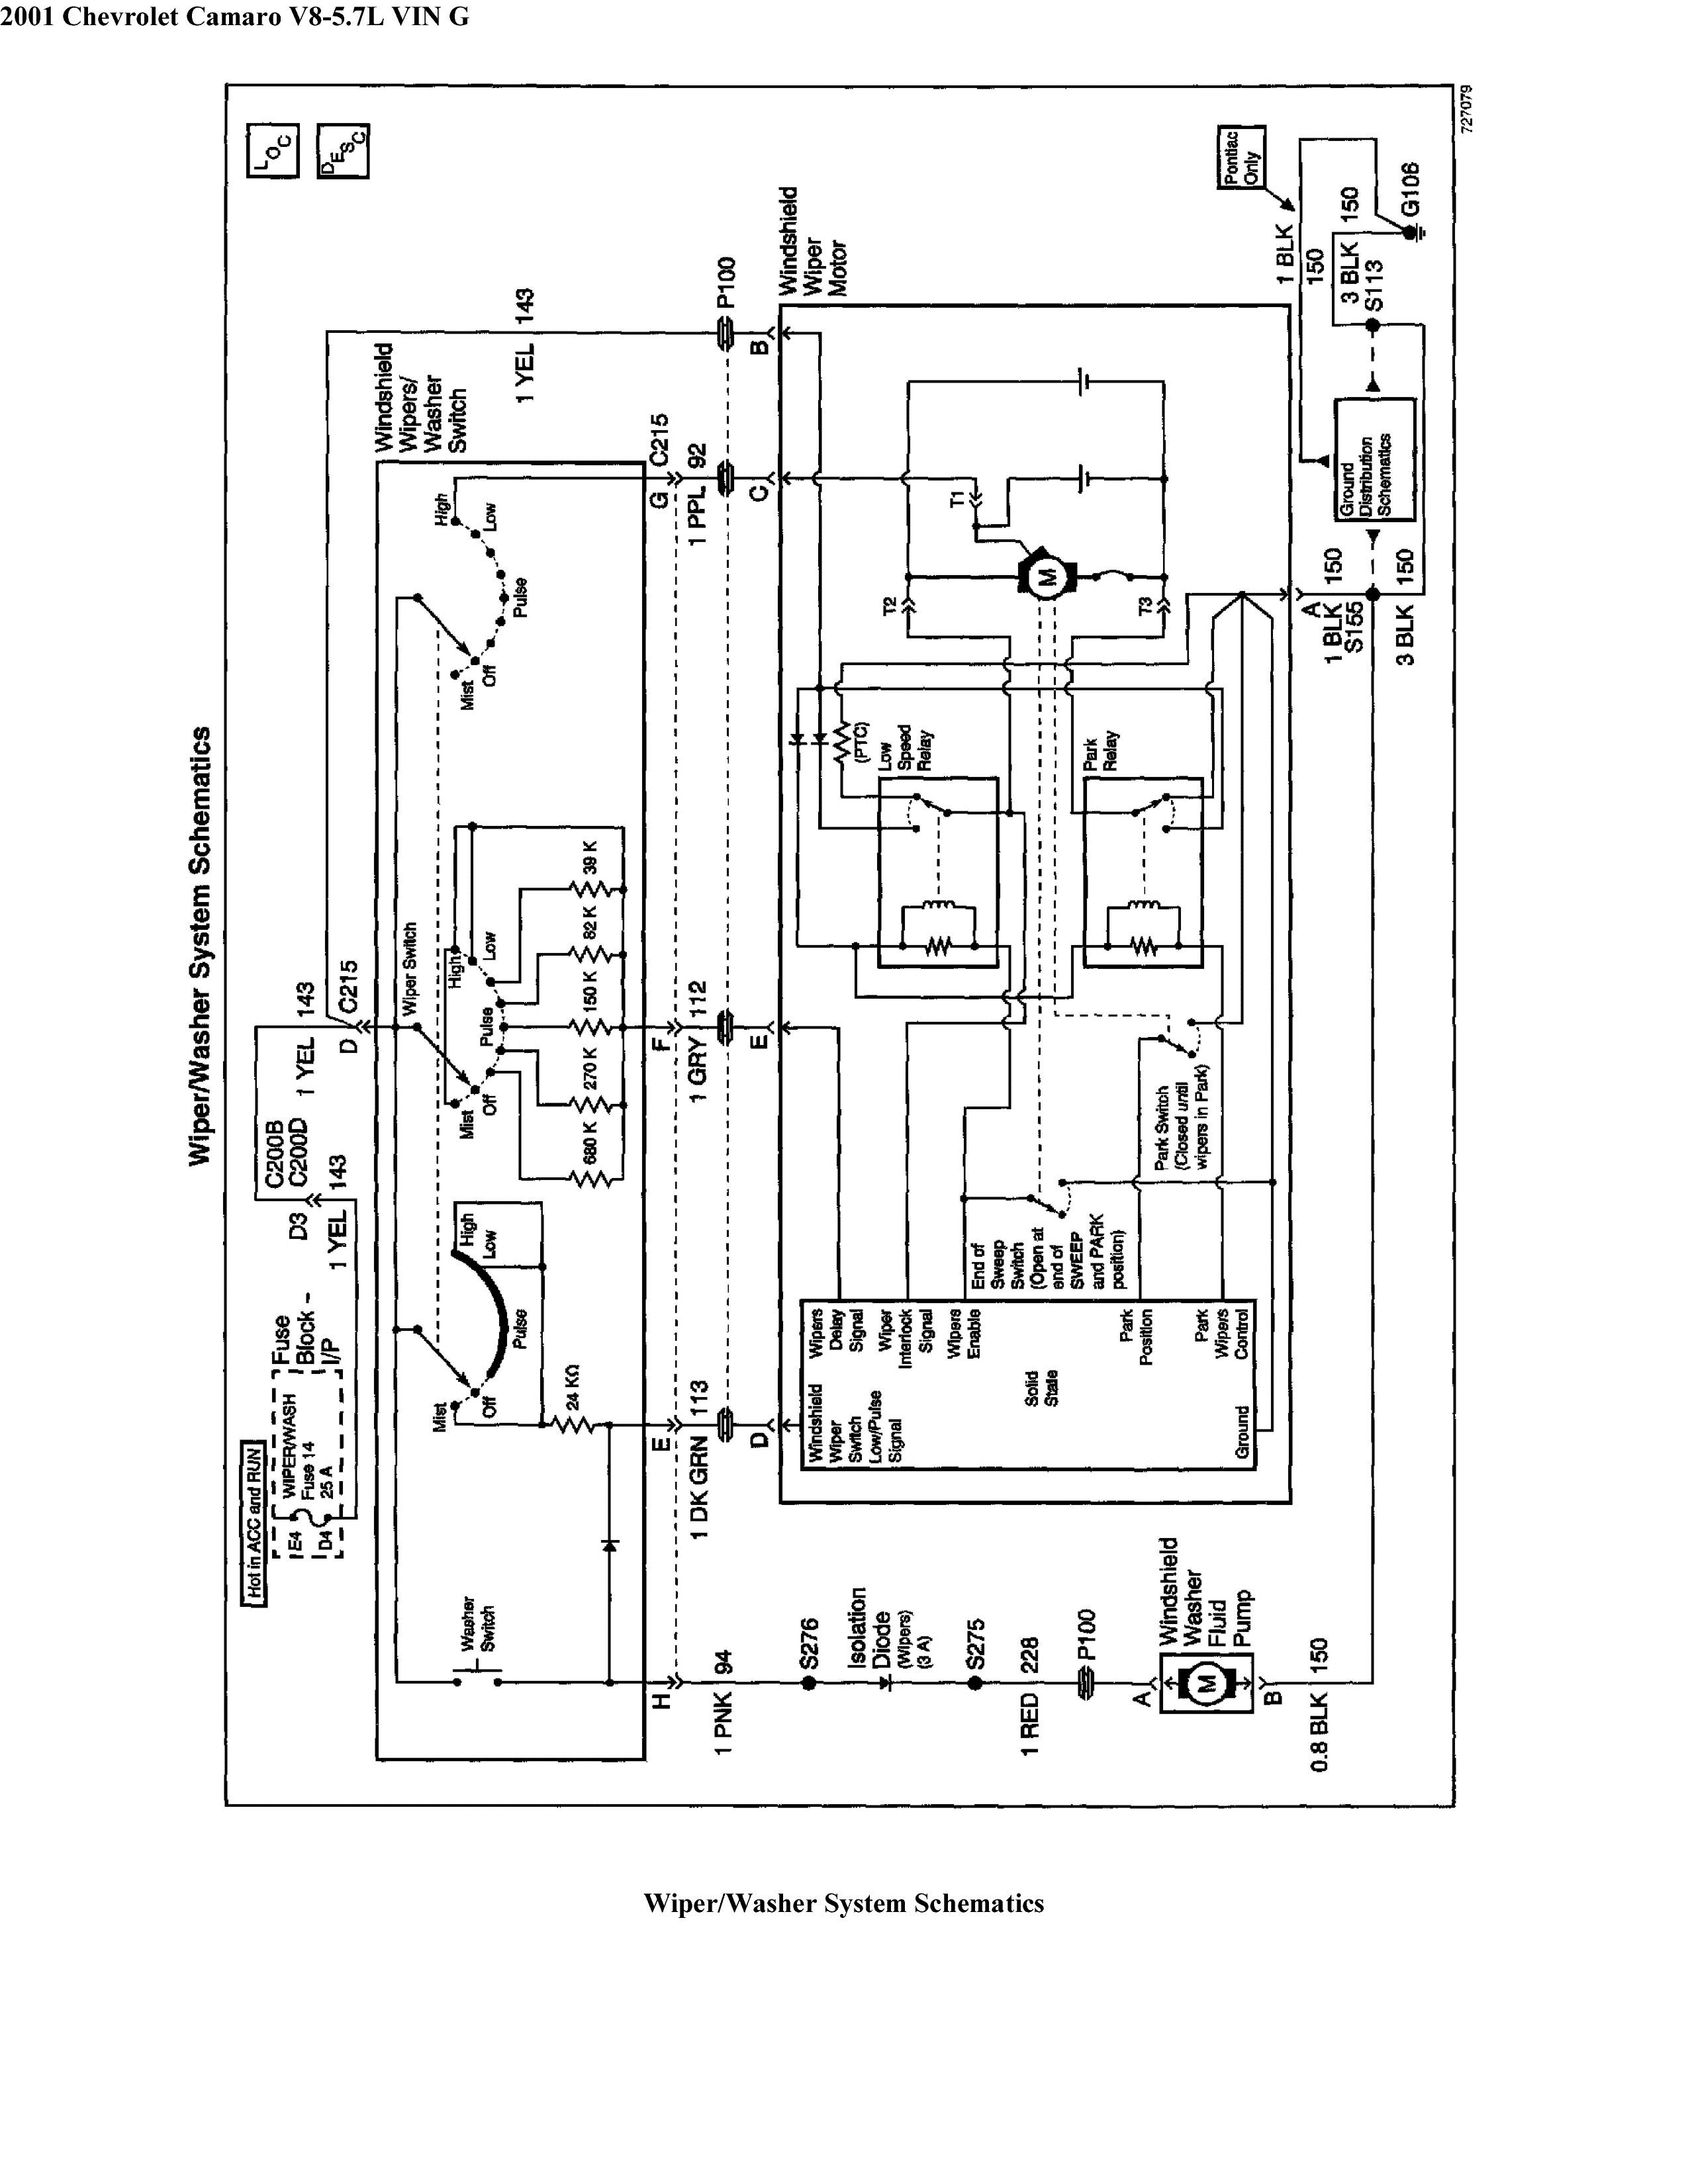 corvette wiper motor wiring diagram on 1982 corvette wiring diagram